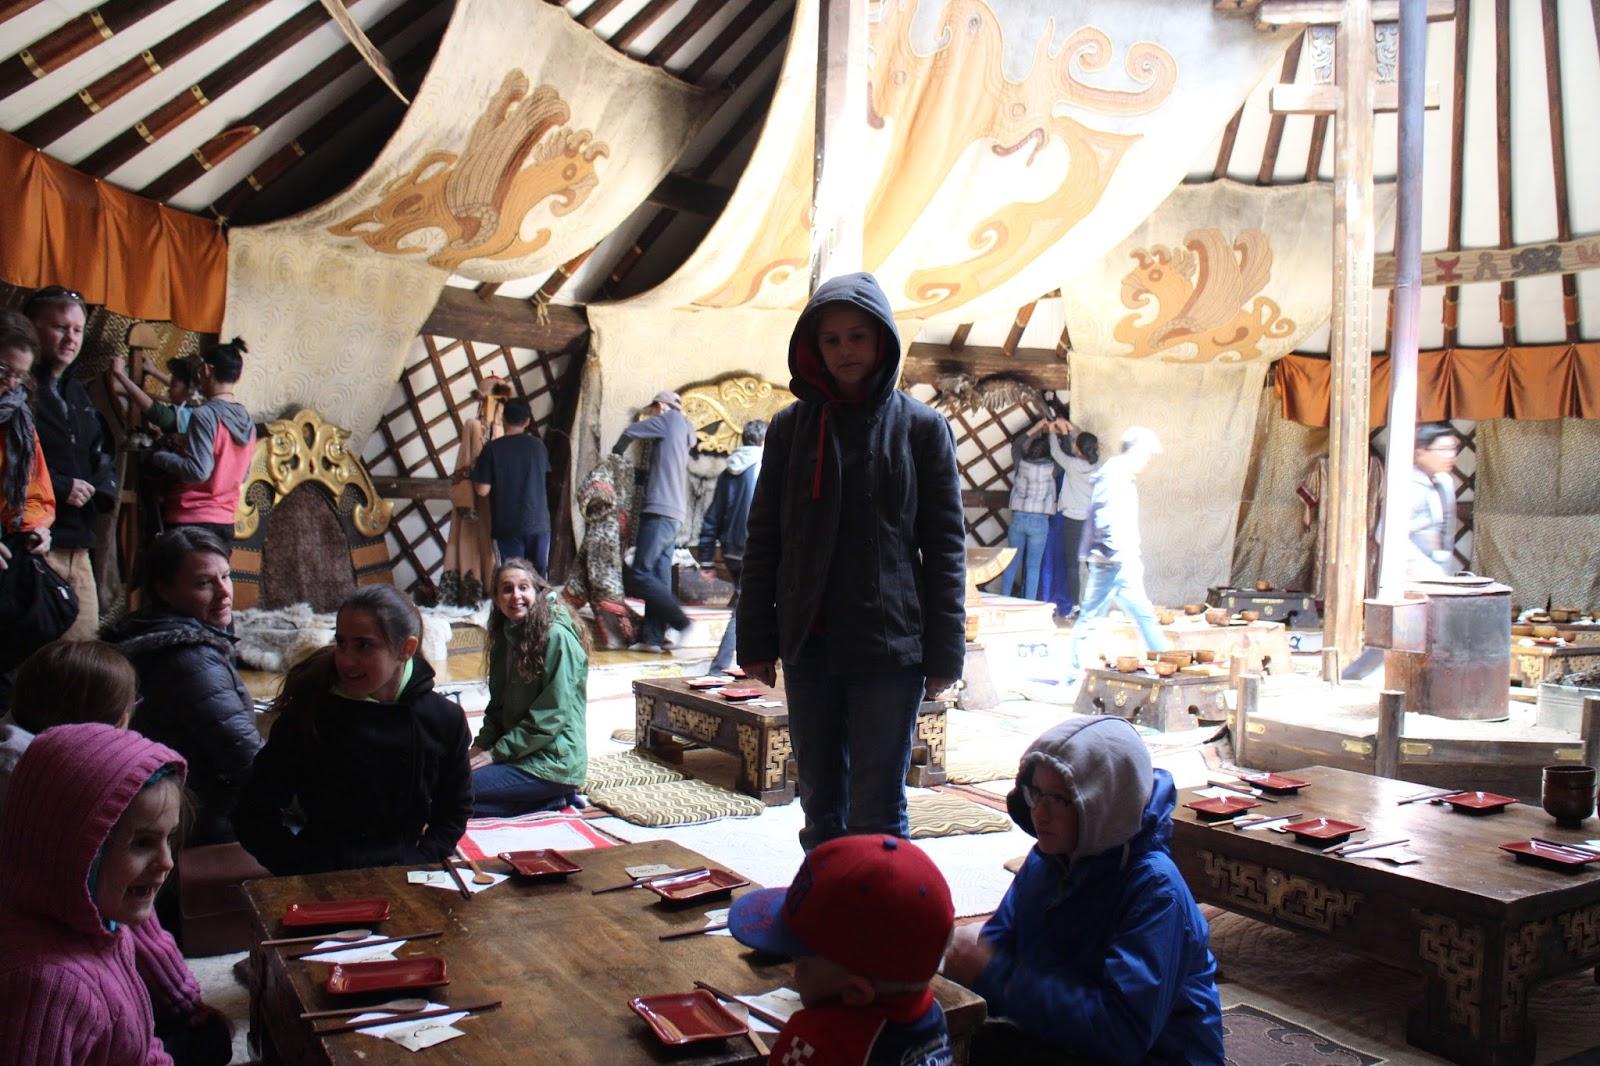 teacher miss k about 2 hours outside ulan bator toward hentii province